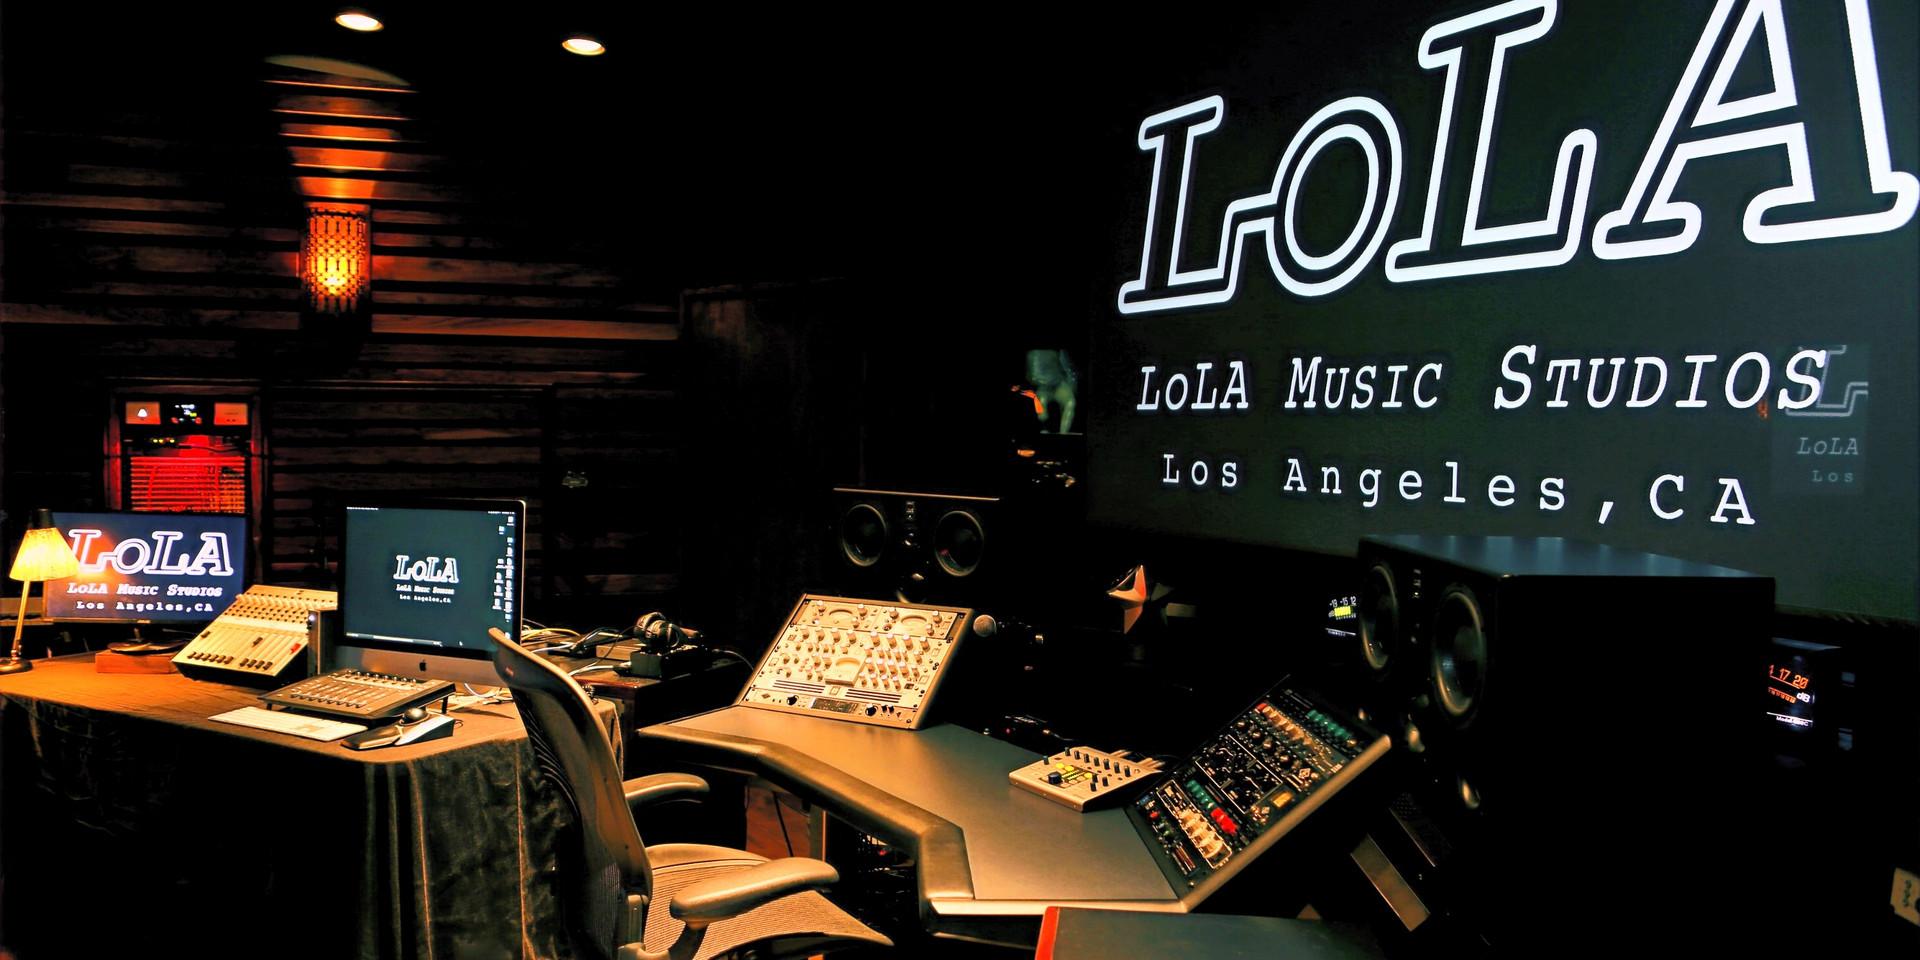 LOLA_STUDIOA_side